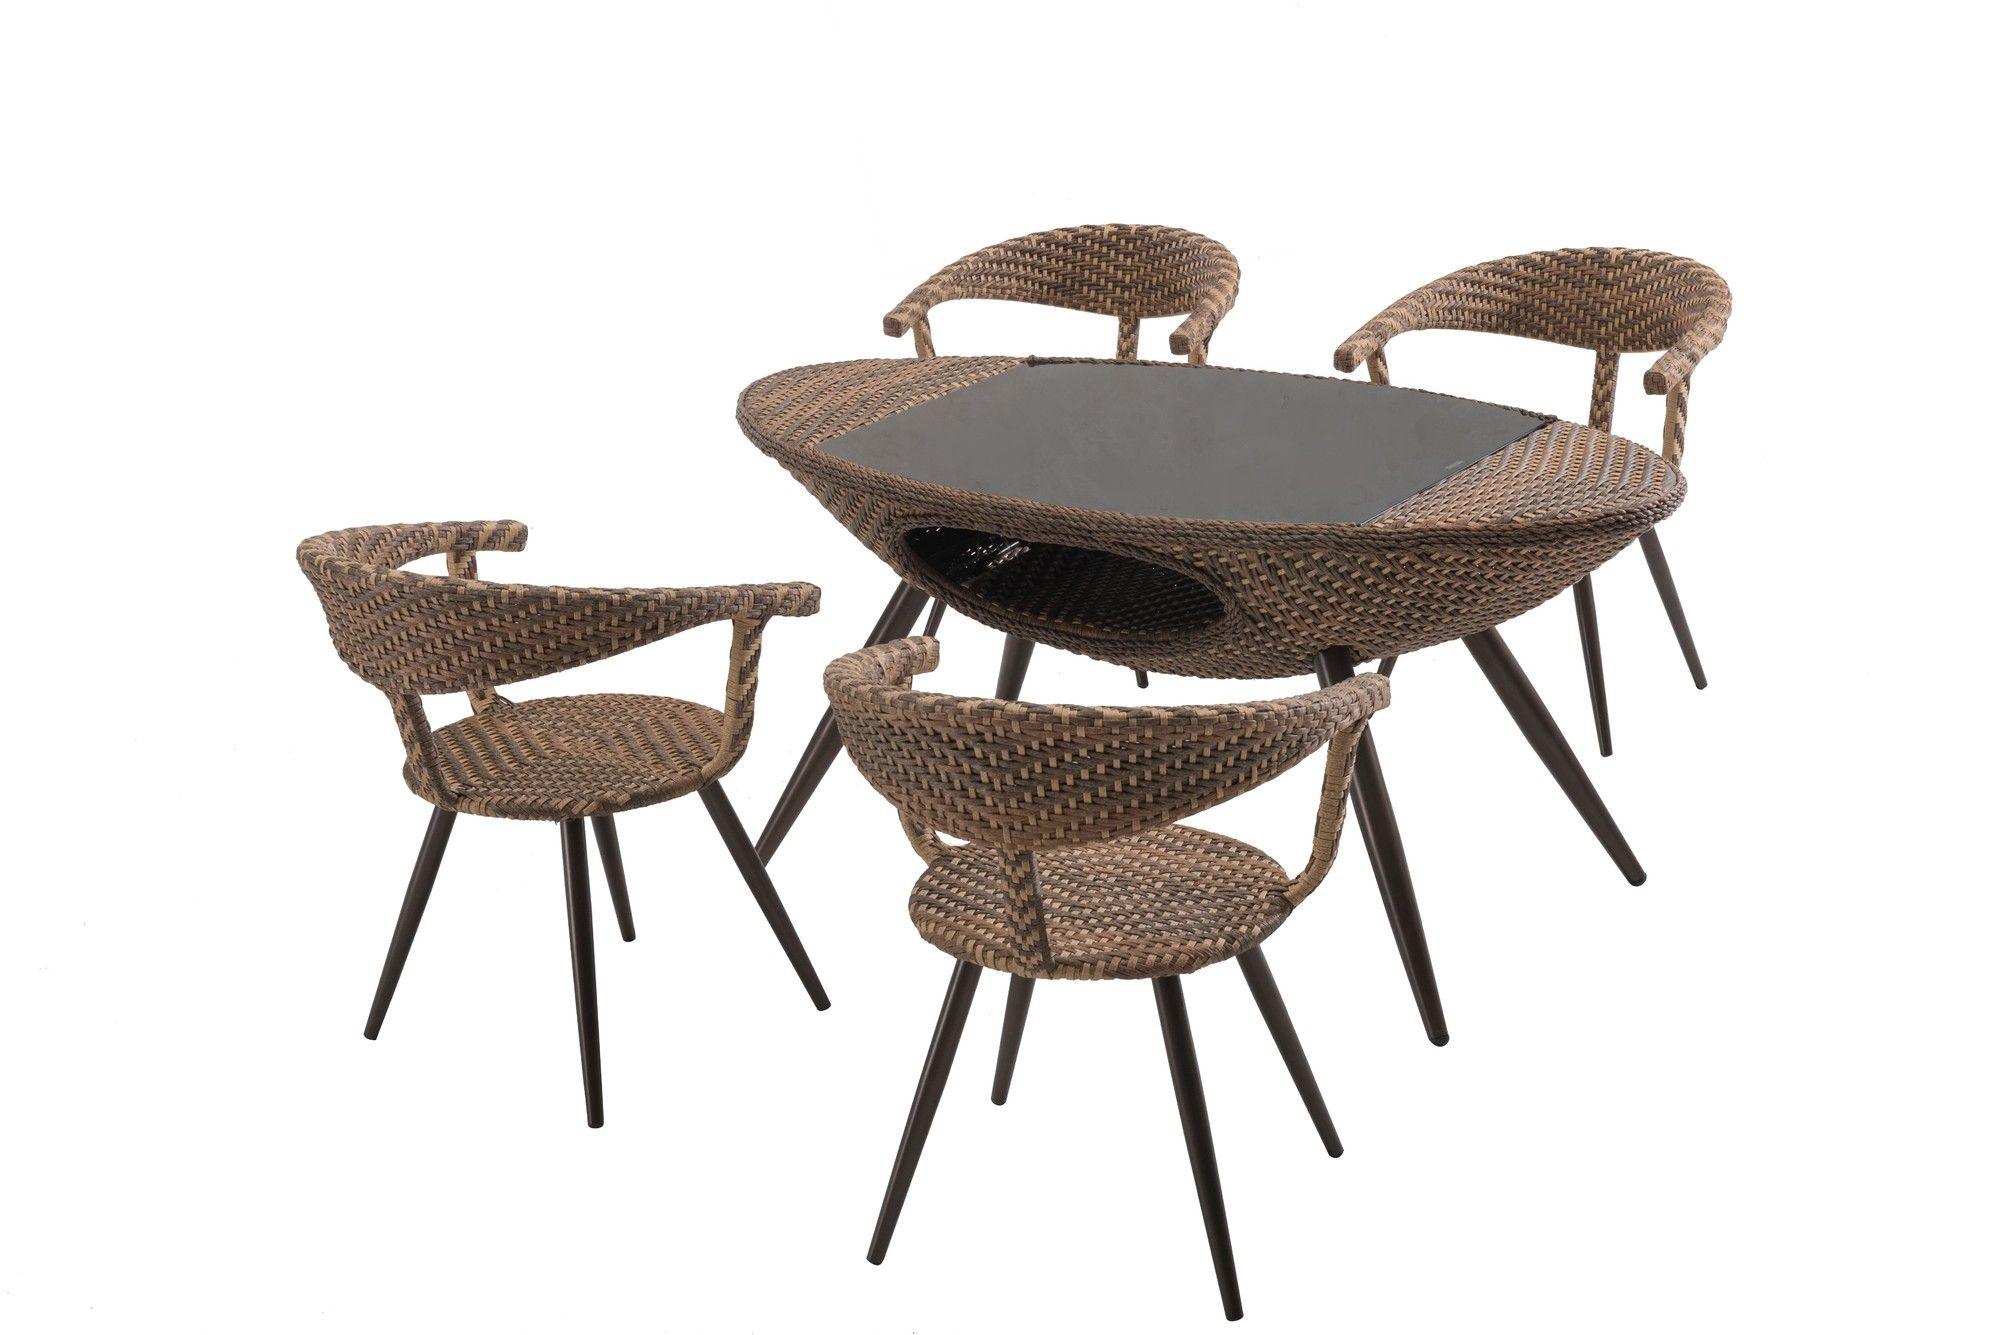 daylen 5 piece dining set products pinterest wicker furniture rh pinterest com